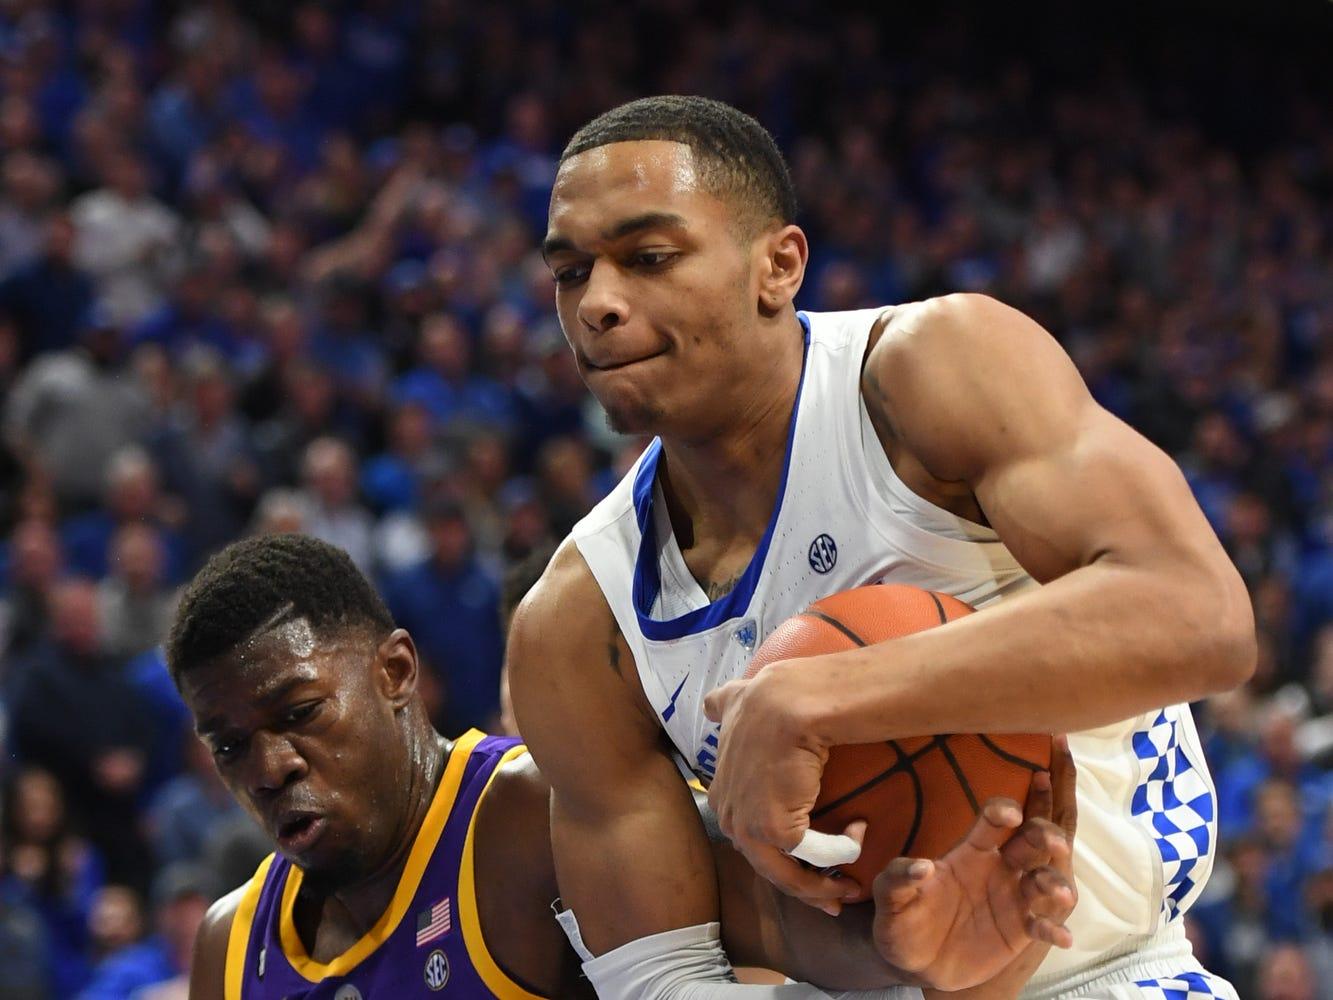 UK F PJ Washington grabs a rebound during the University of Kentucky men's basketball game against Louisiana State University at Rupp Arena on Feb. 12, 2018.